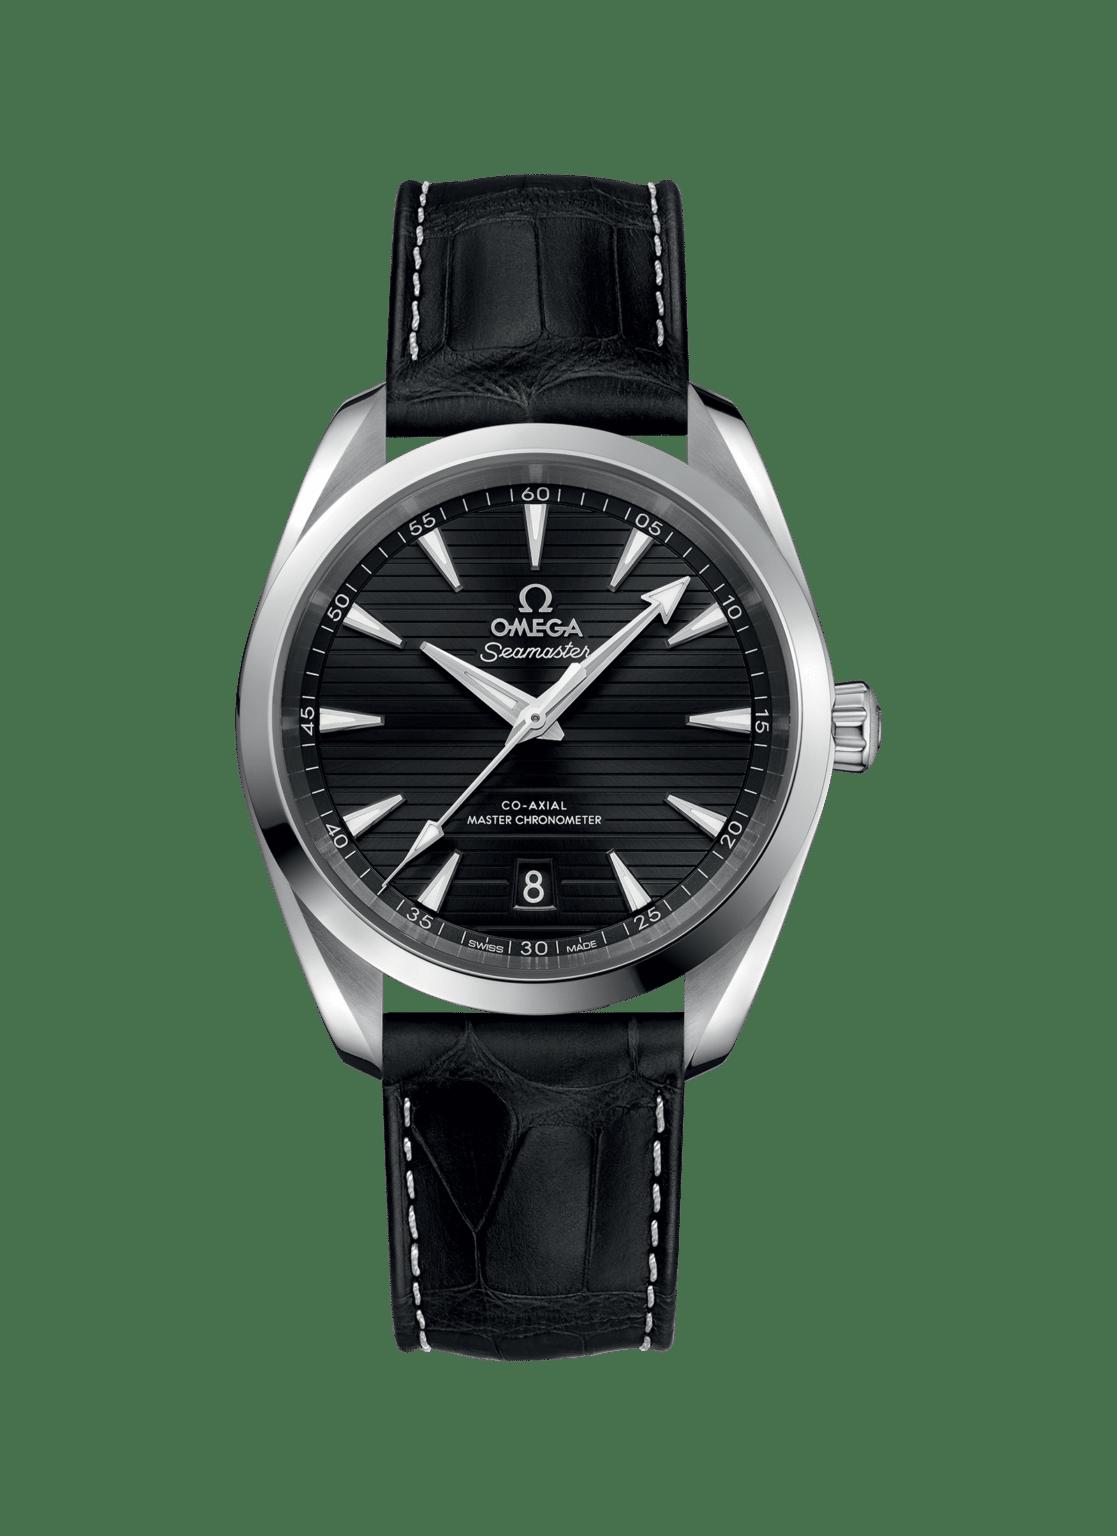 Omega – Seamaster – Aqua Terra 150 M Co‑Axial Master Chronometer 38 mm - Wagner Bijouterie Uhren